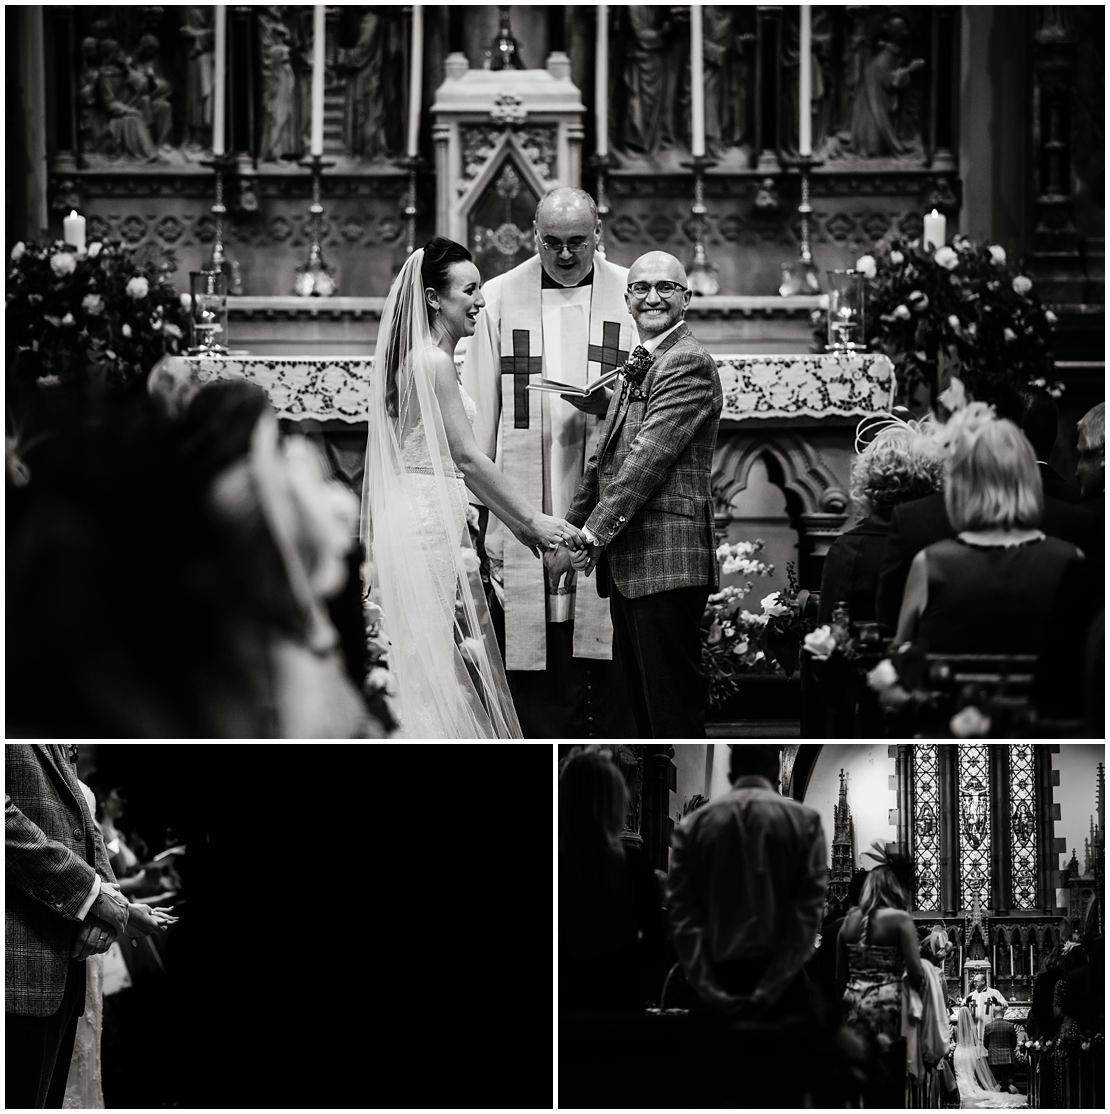 Bolton Abbey Tithe Barn Wedding Photographer 0066